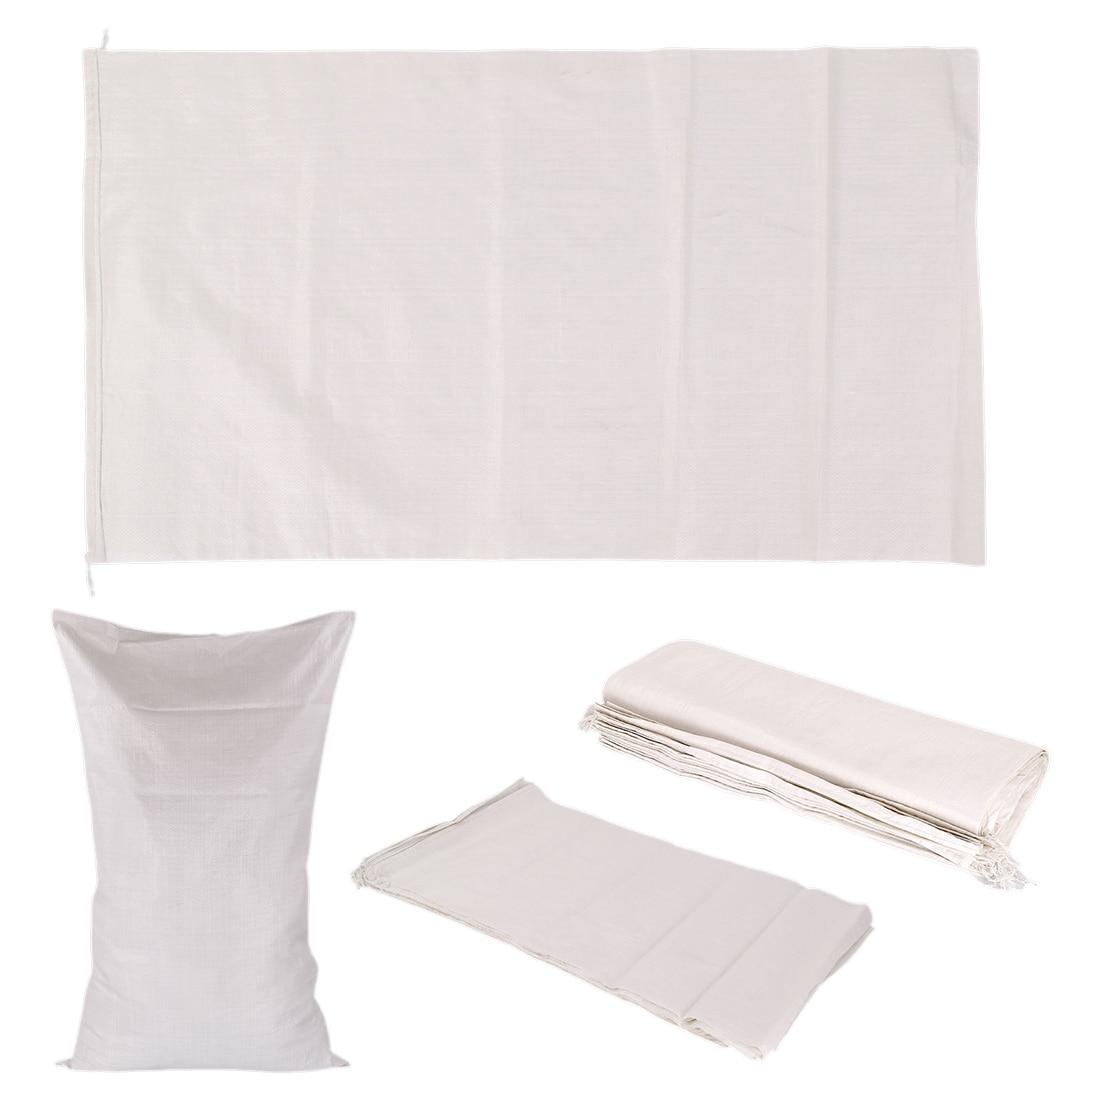 Hot 25 x Extra Large Woven Polypropylene Sacks Strong Rubble Bags Size 60x100cm Amount:25 PCS